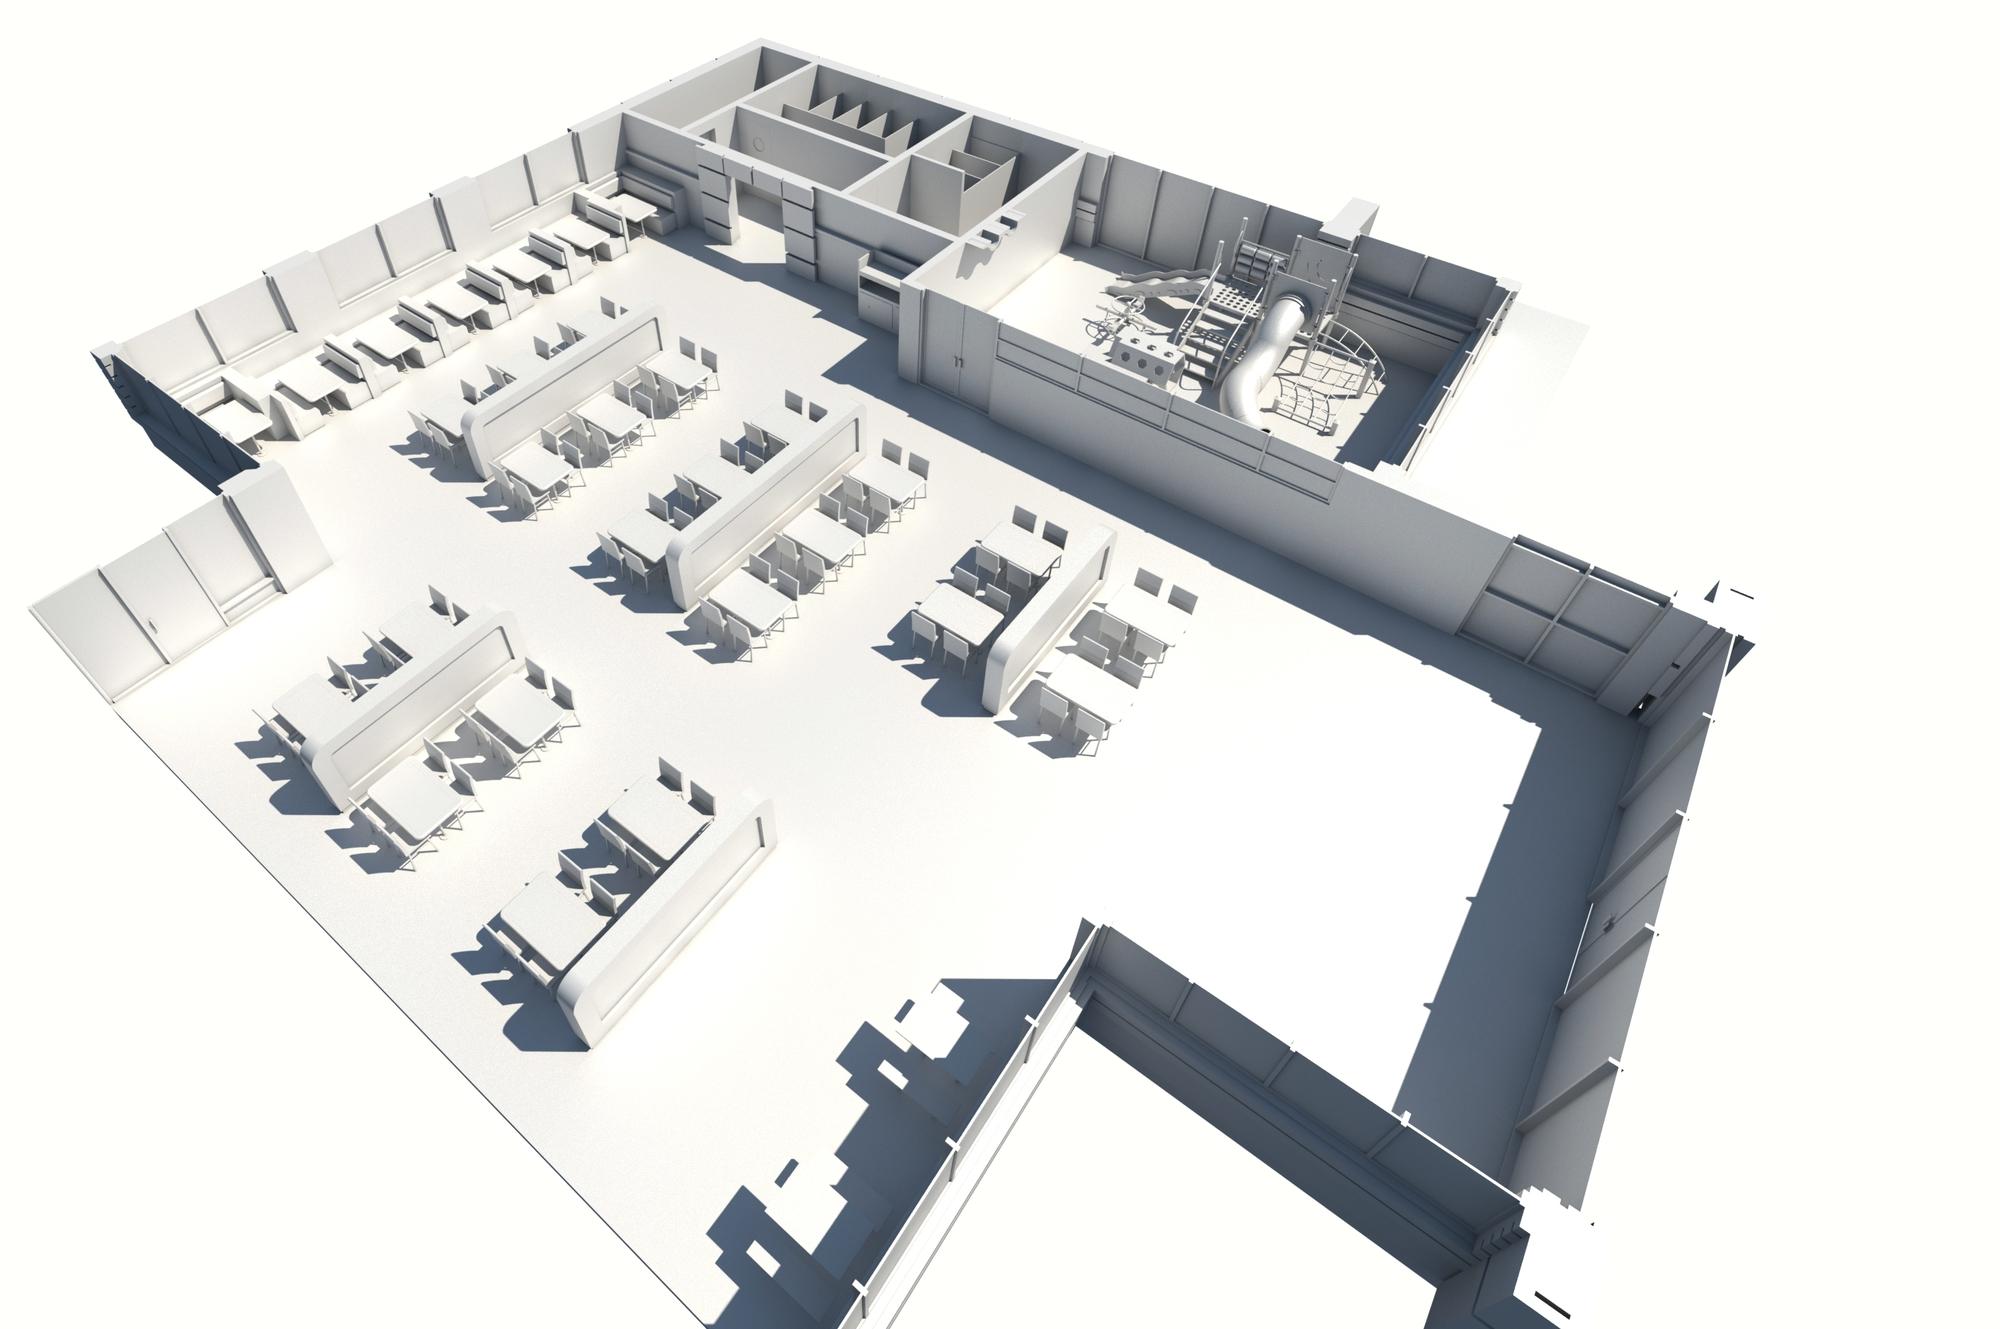 Raas-rendering20141105-9334-3pxauc